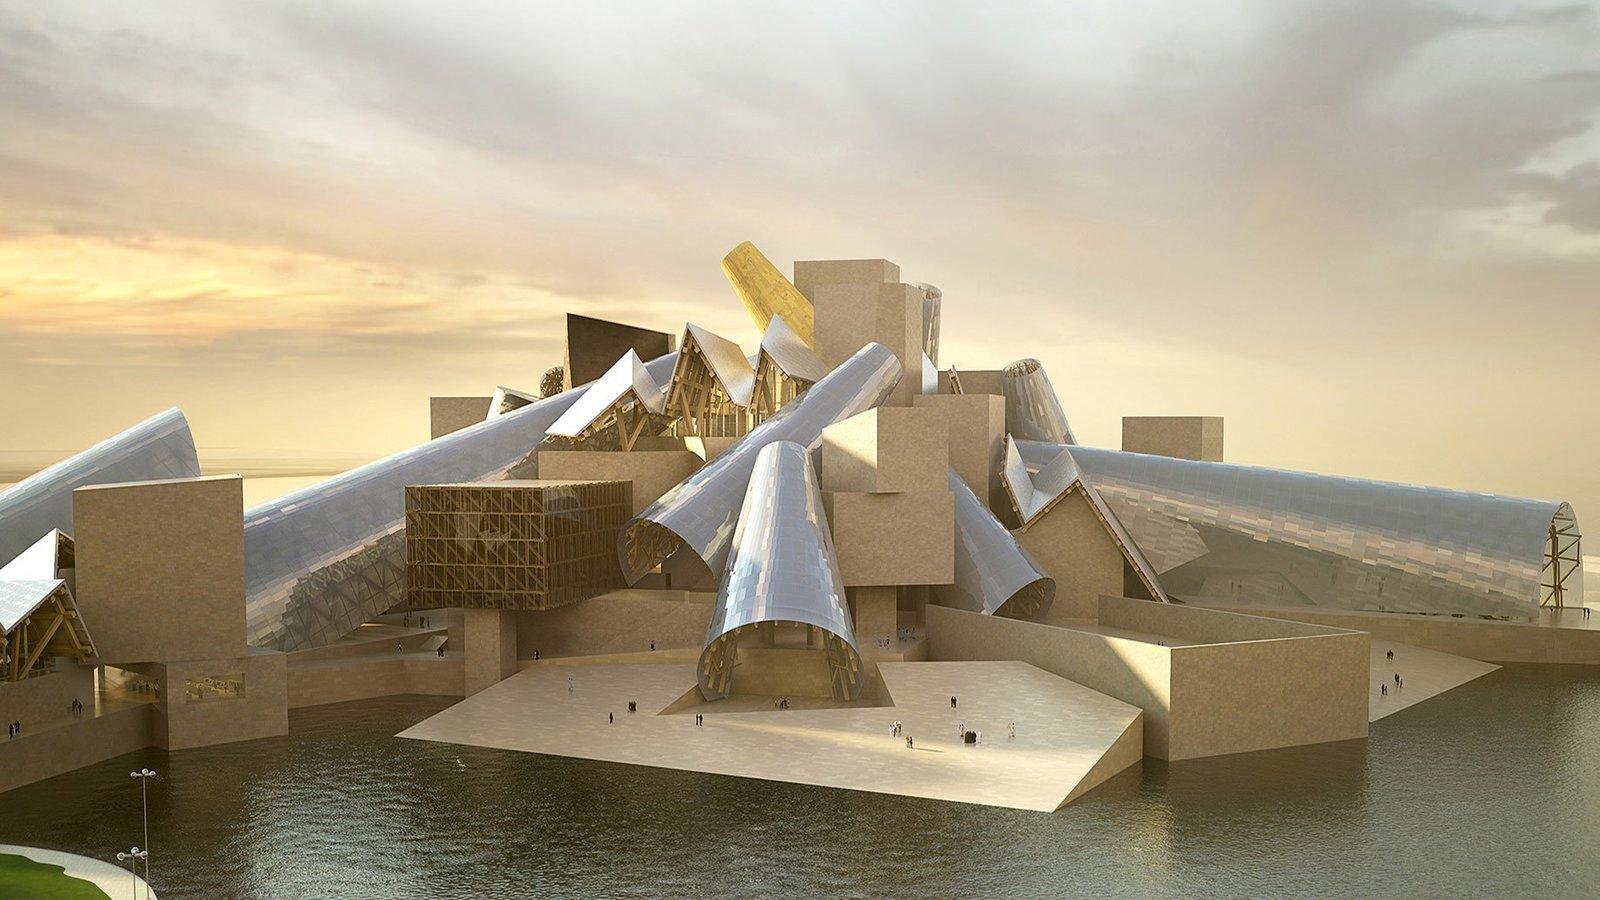 Frank Gehry's Guggenheim Abu Dhabi Set to Break Ground